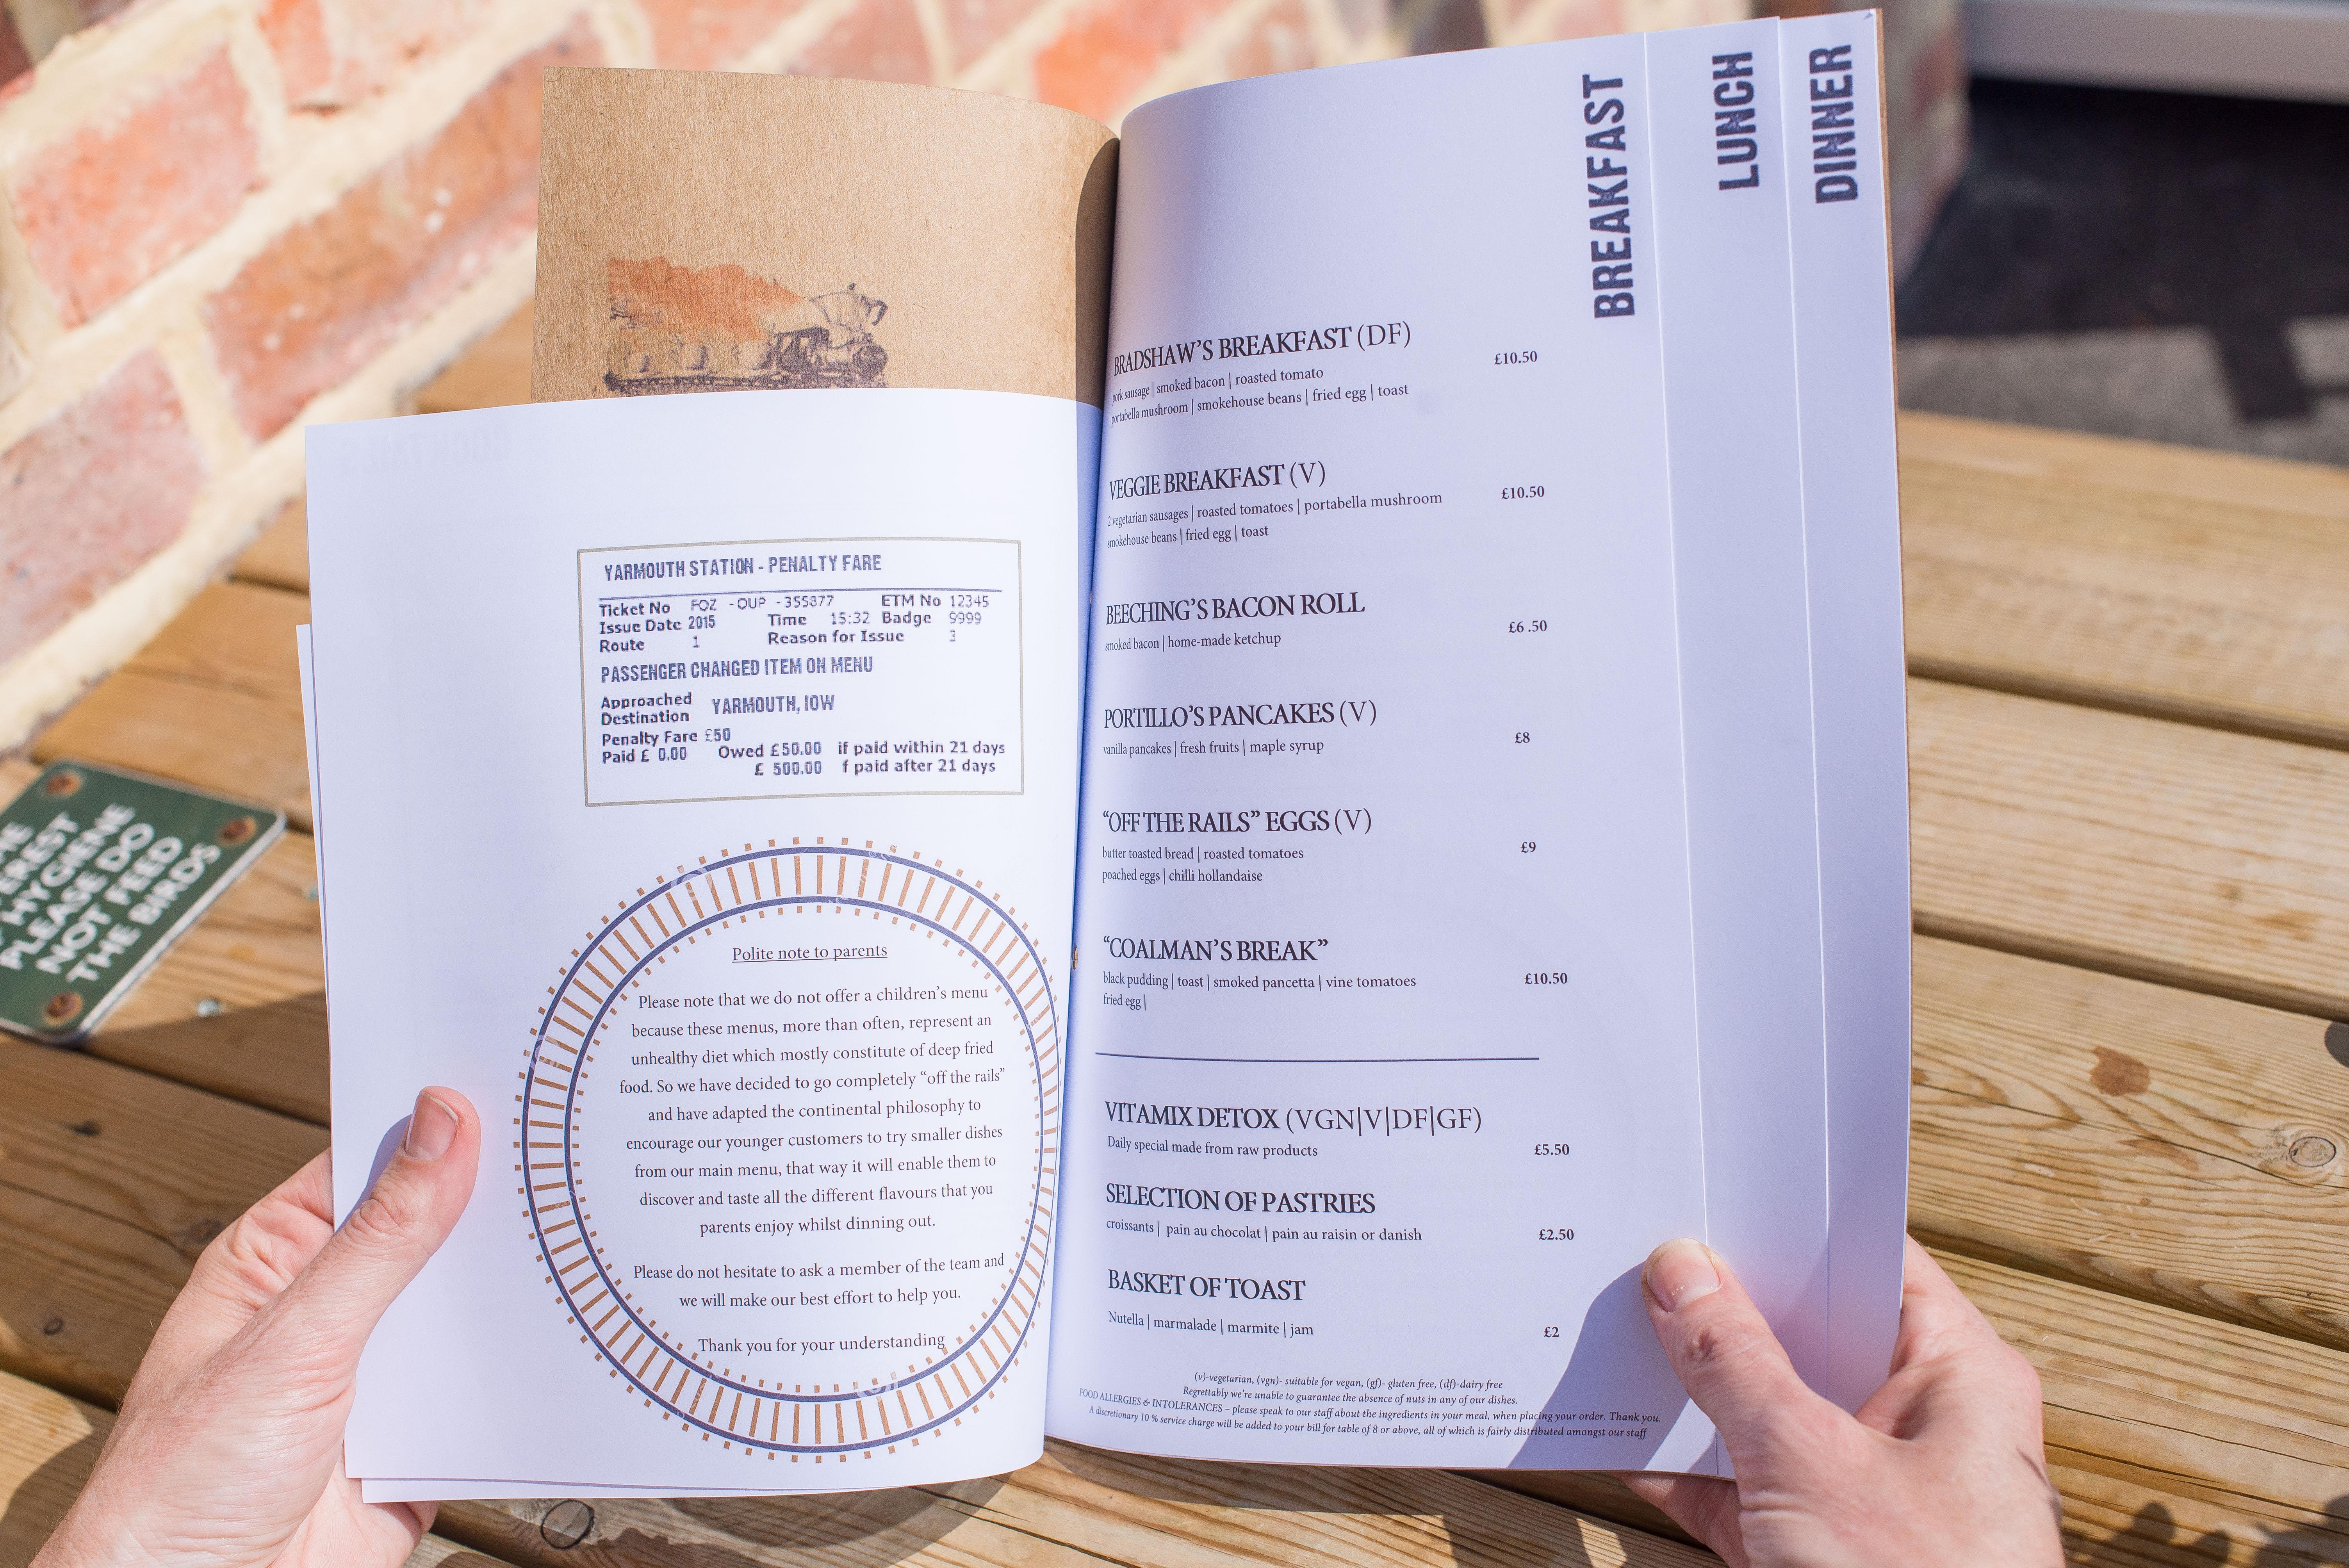 off-the-rails-menu (1 of 1)-2